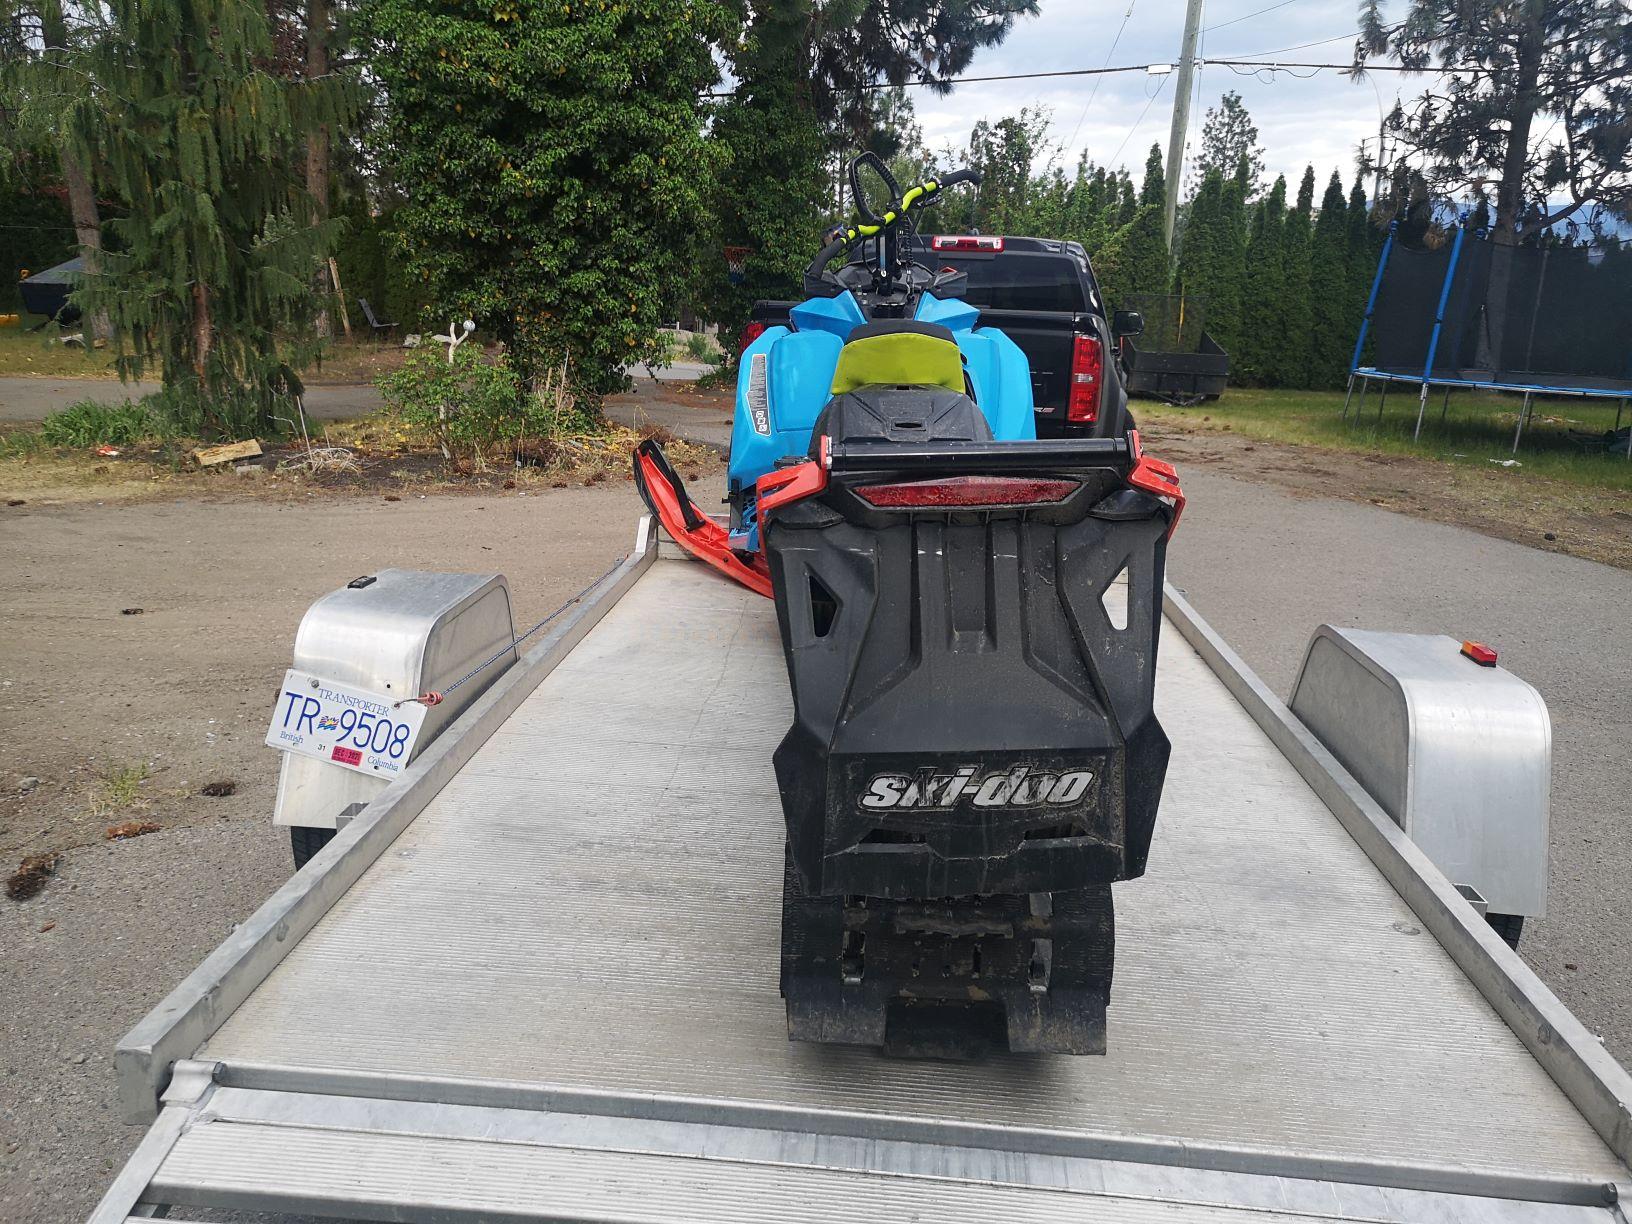 2018 Skidoo Summit 850X 175ETEC Located in Kelowna